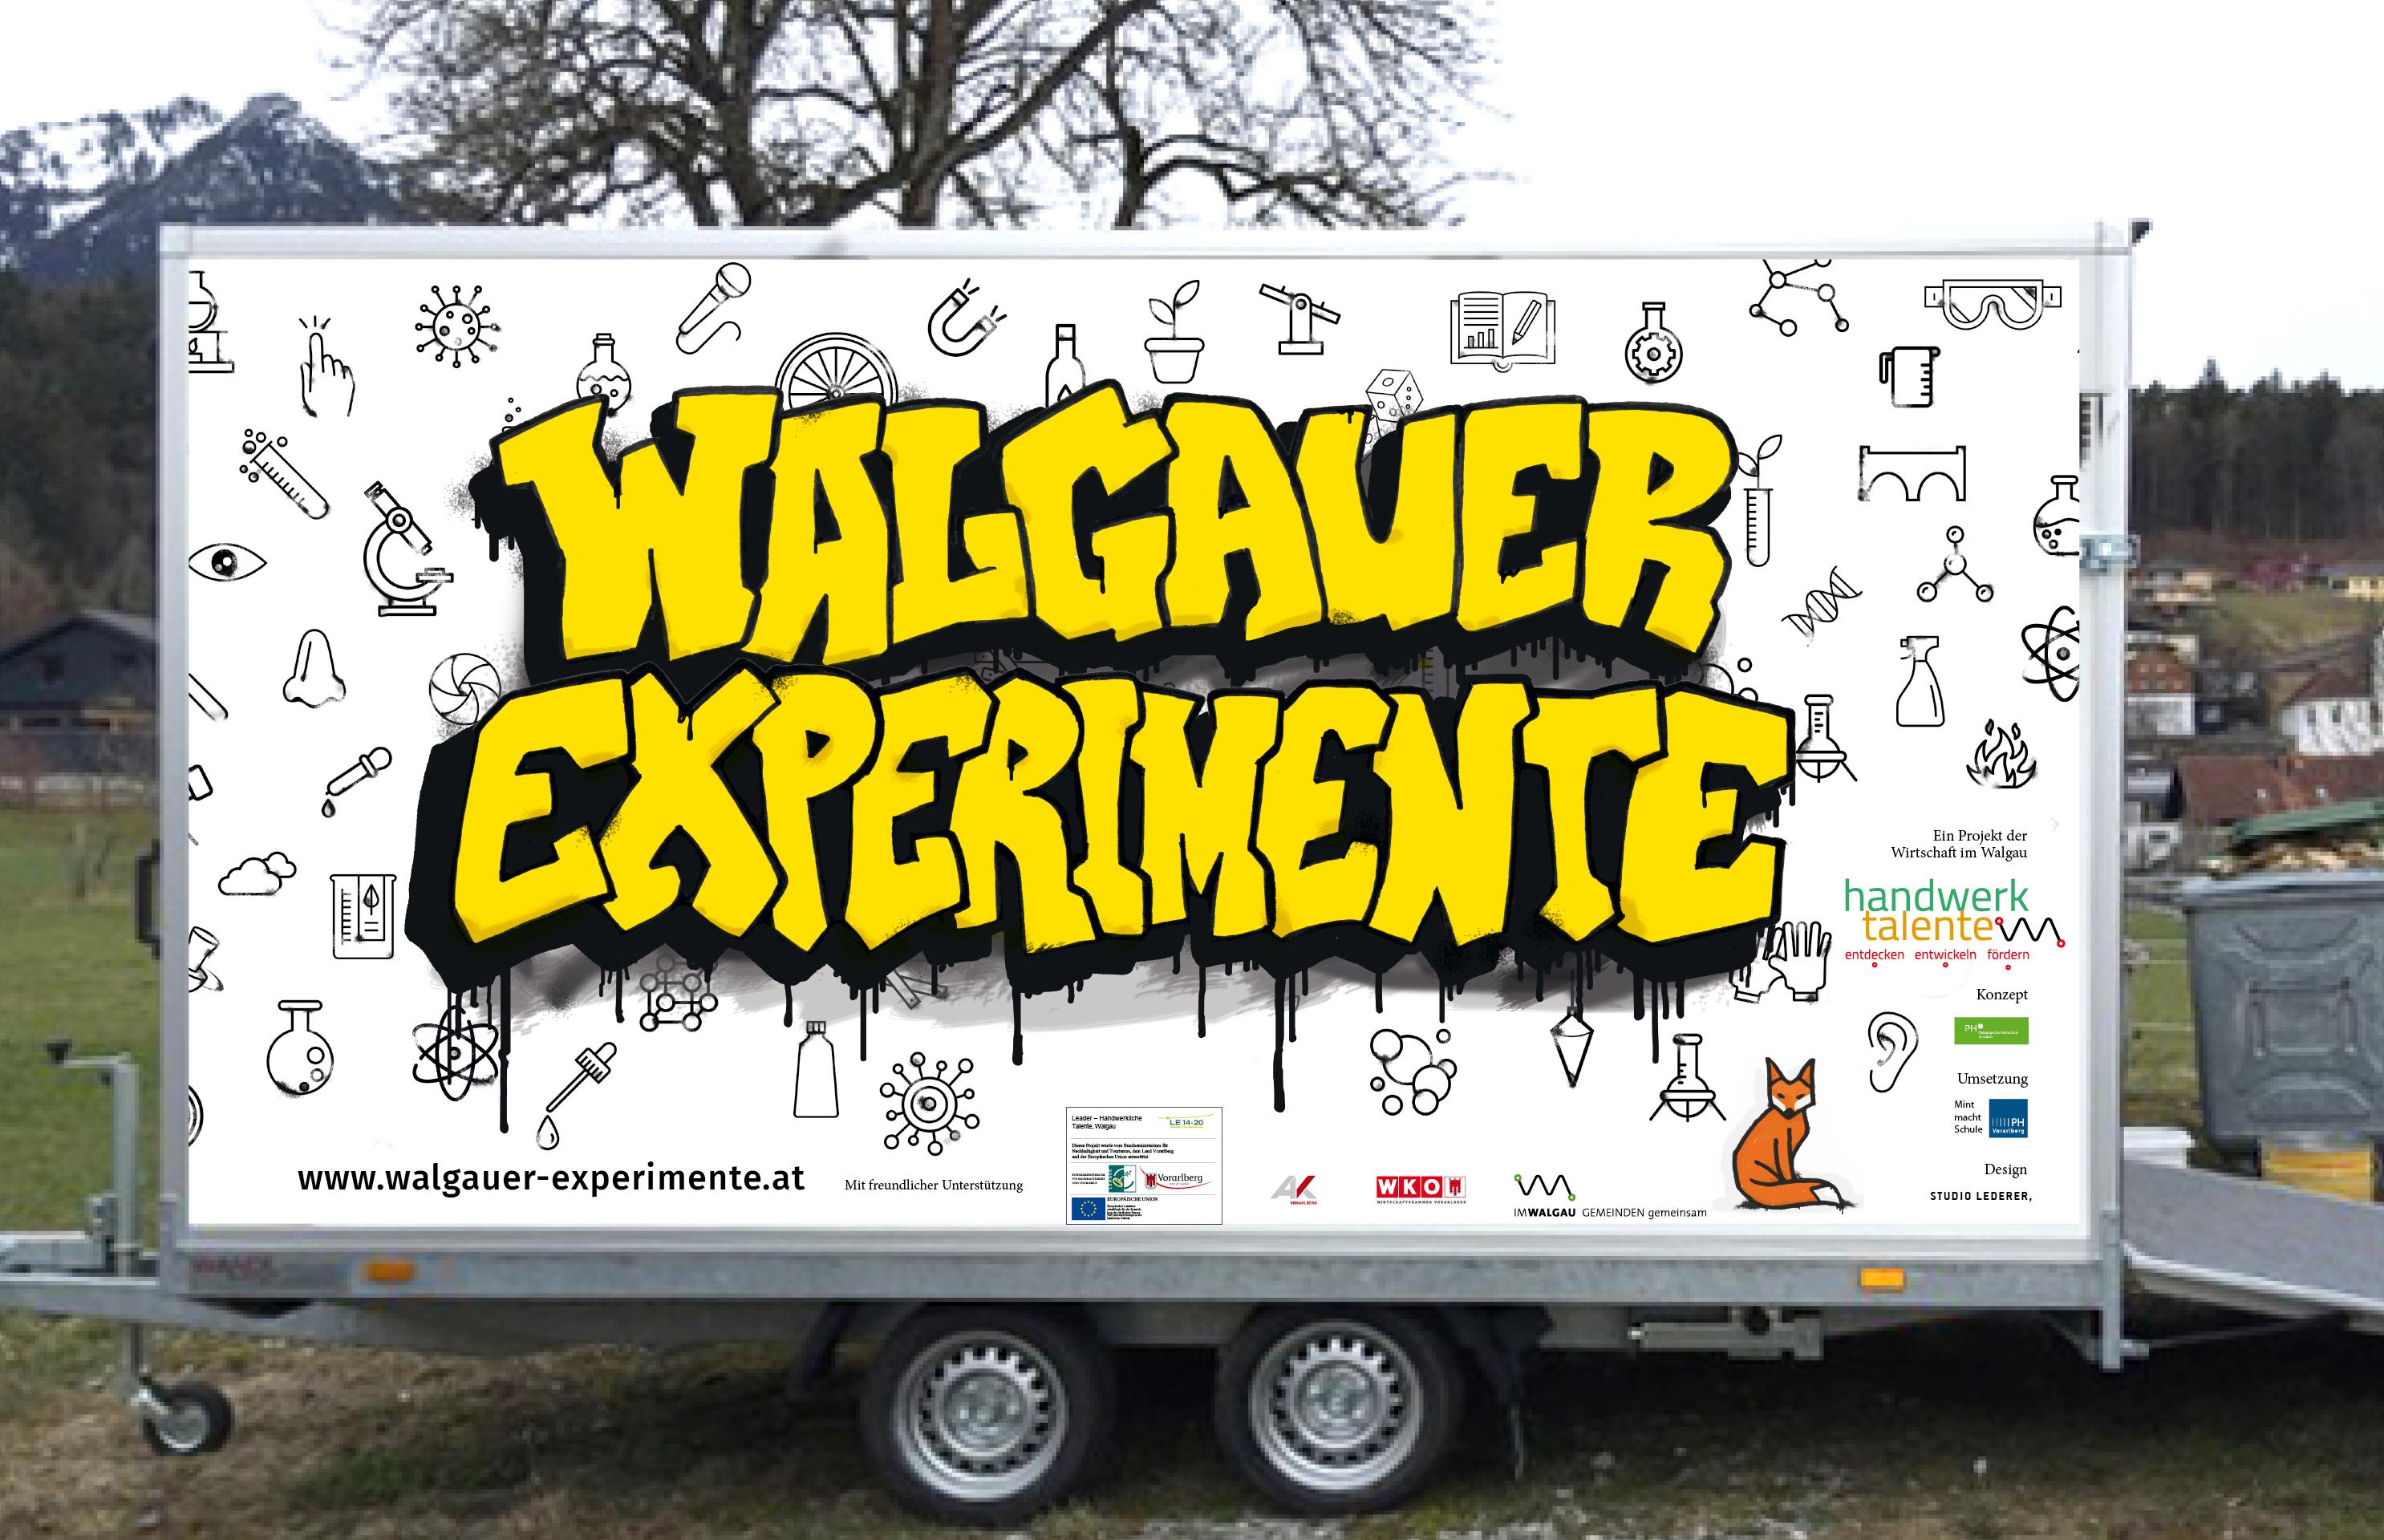 WalgauerExperimente